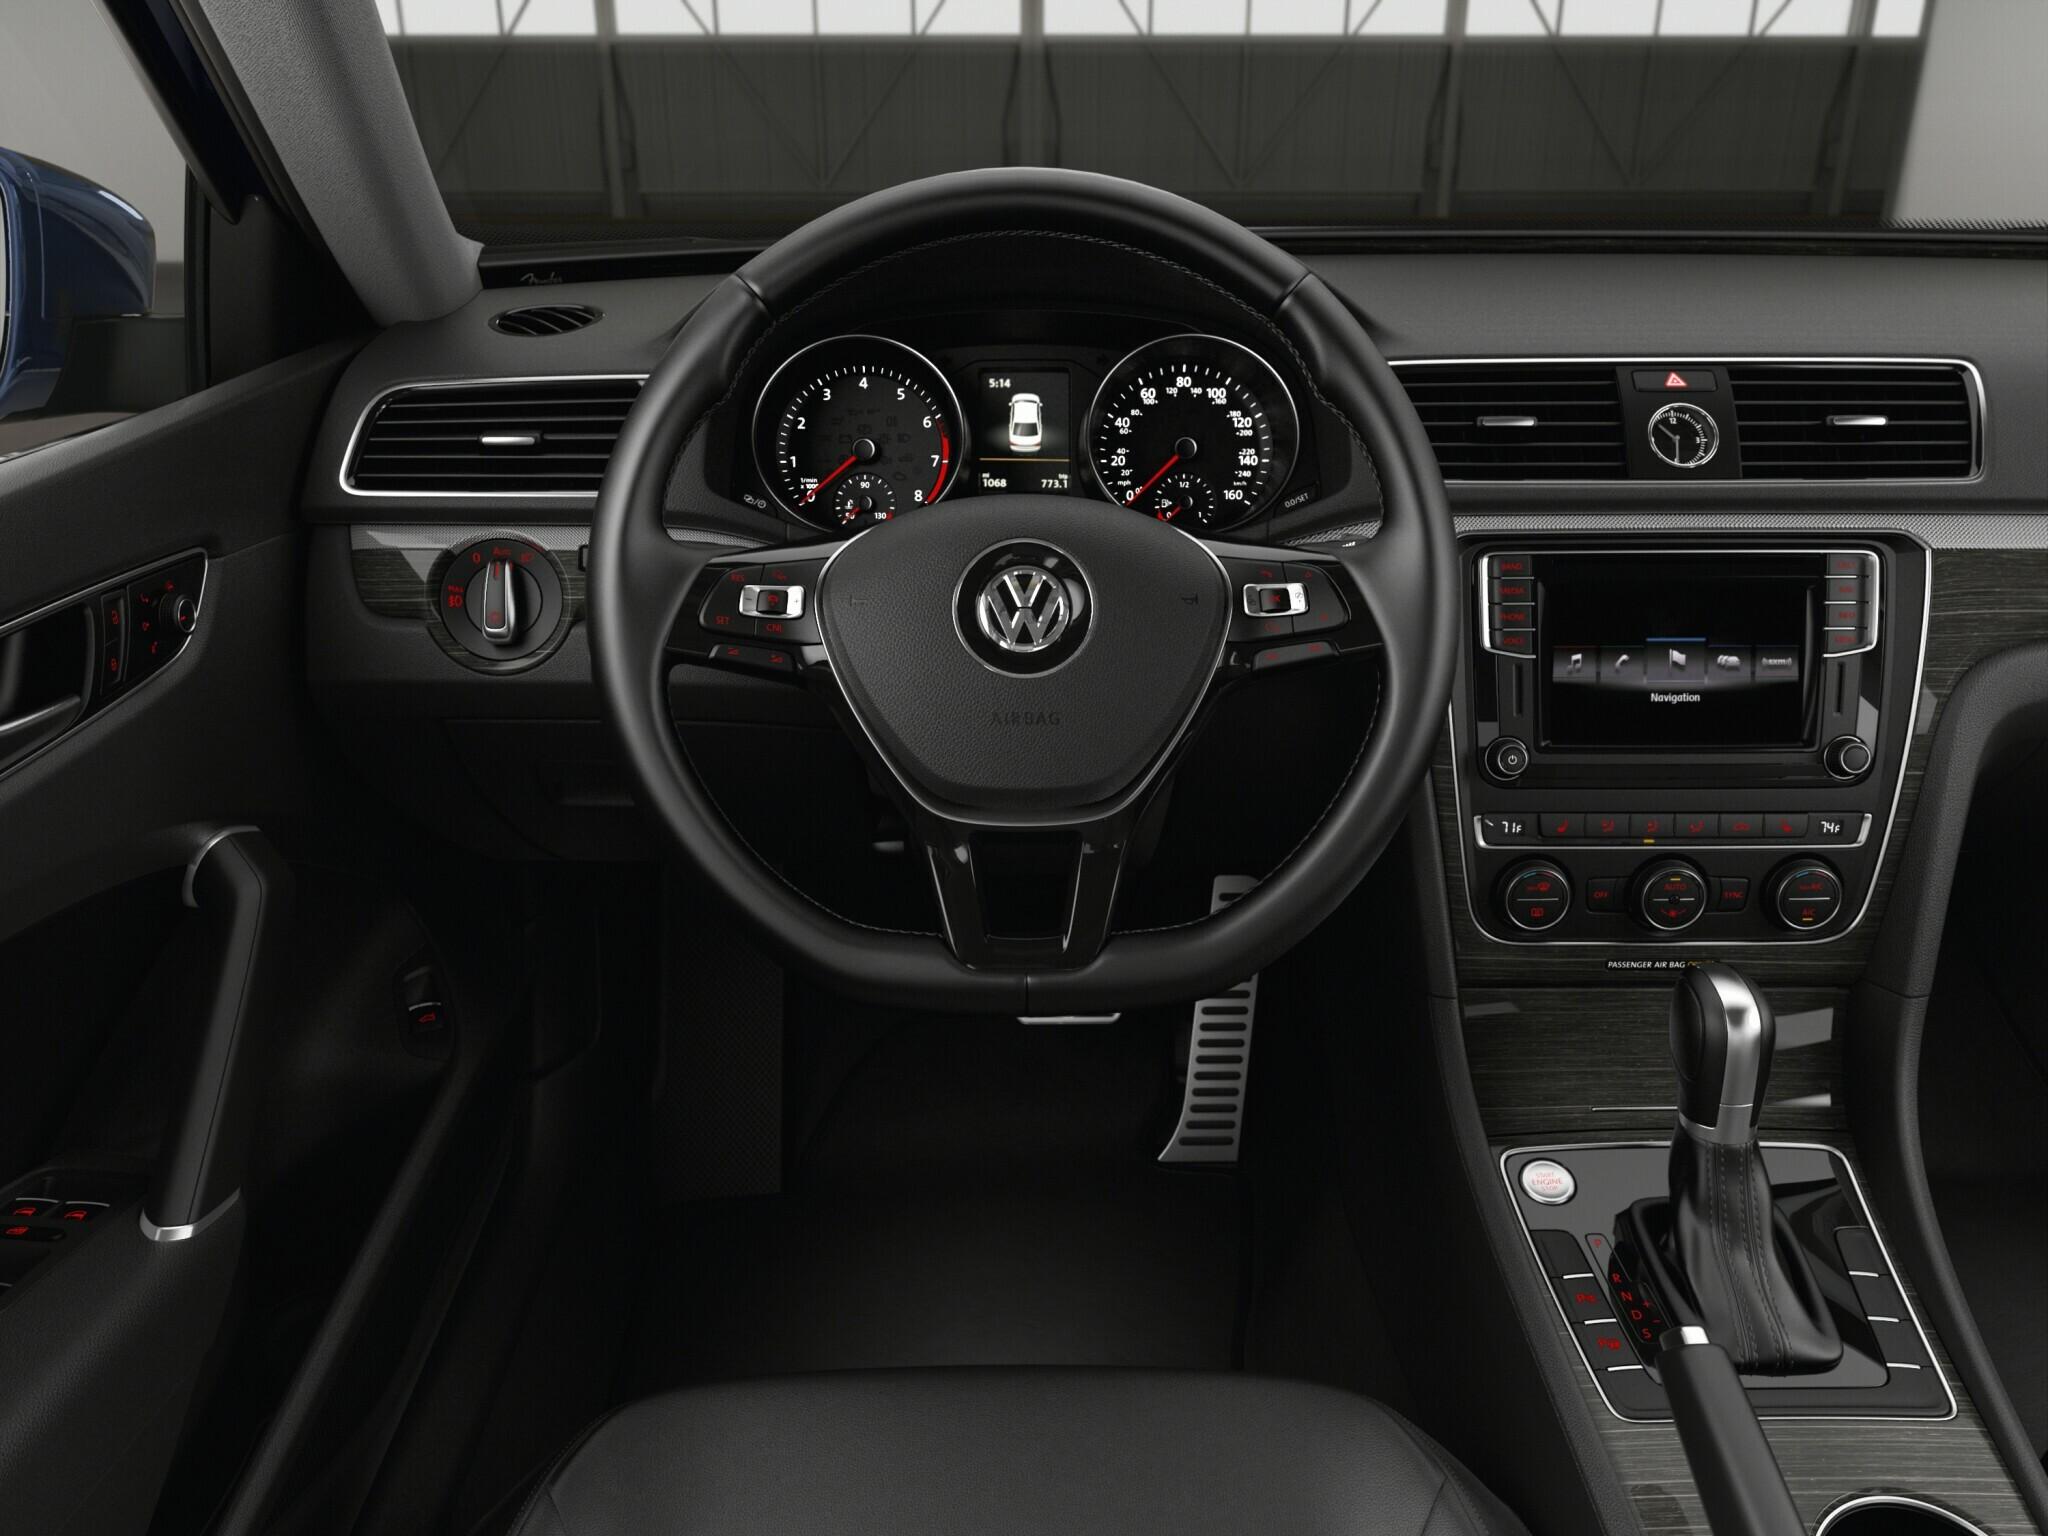 2016 Vw Pat 1 8t Sel Premium Trim Features Volkswagen